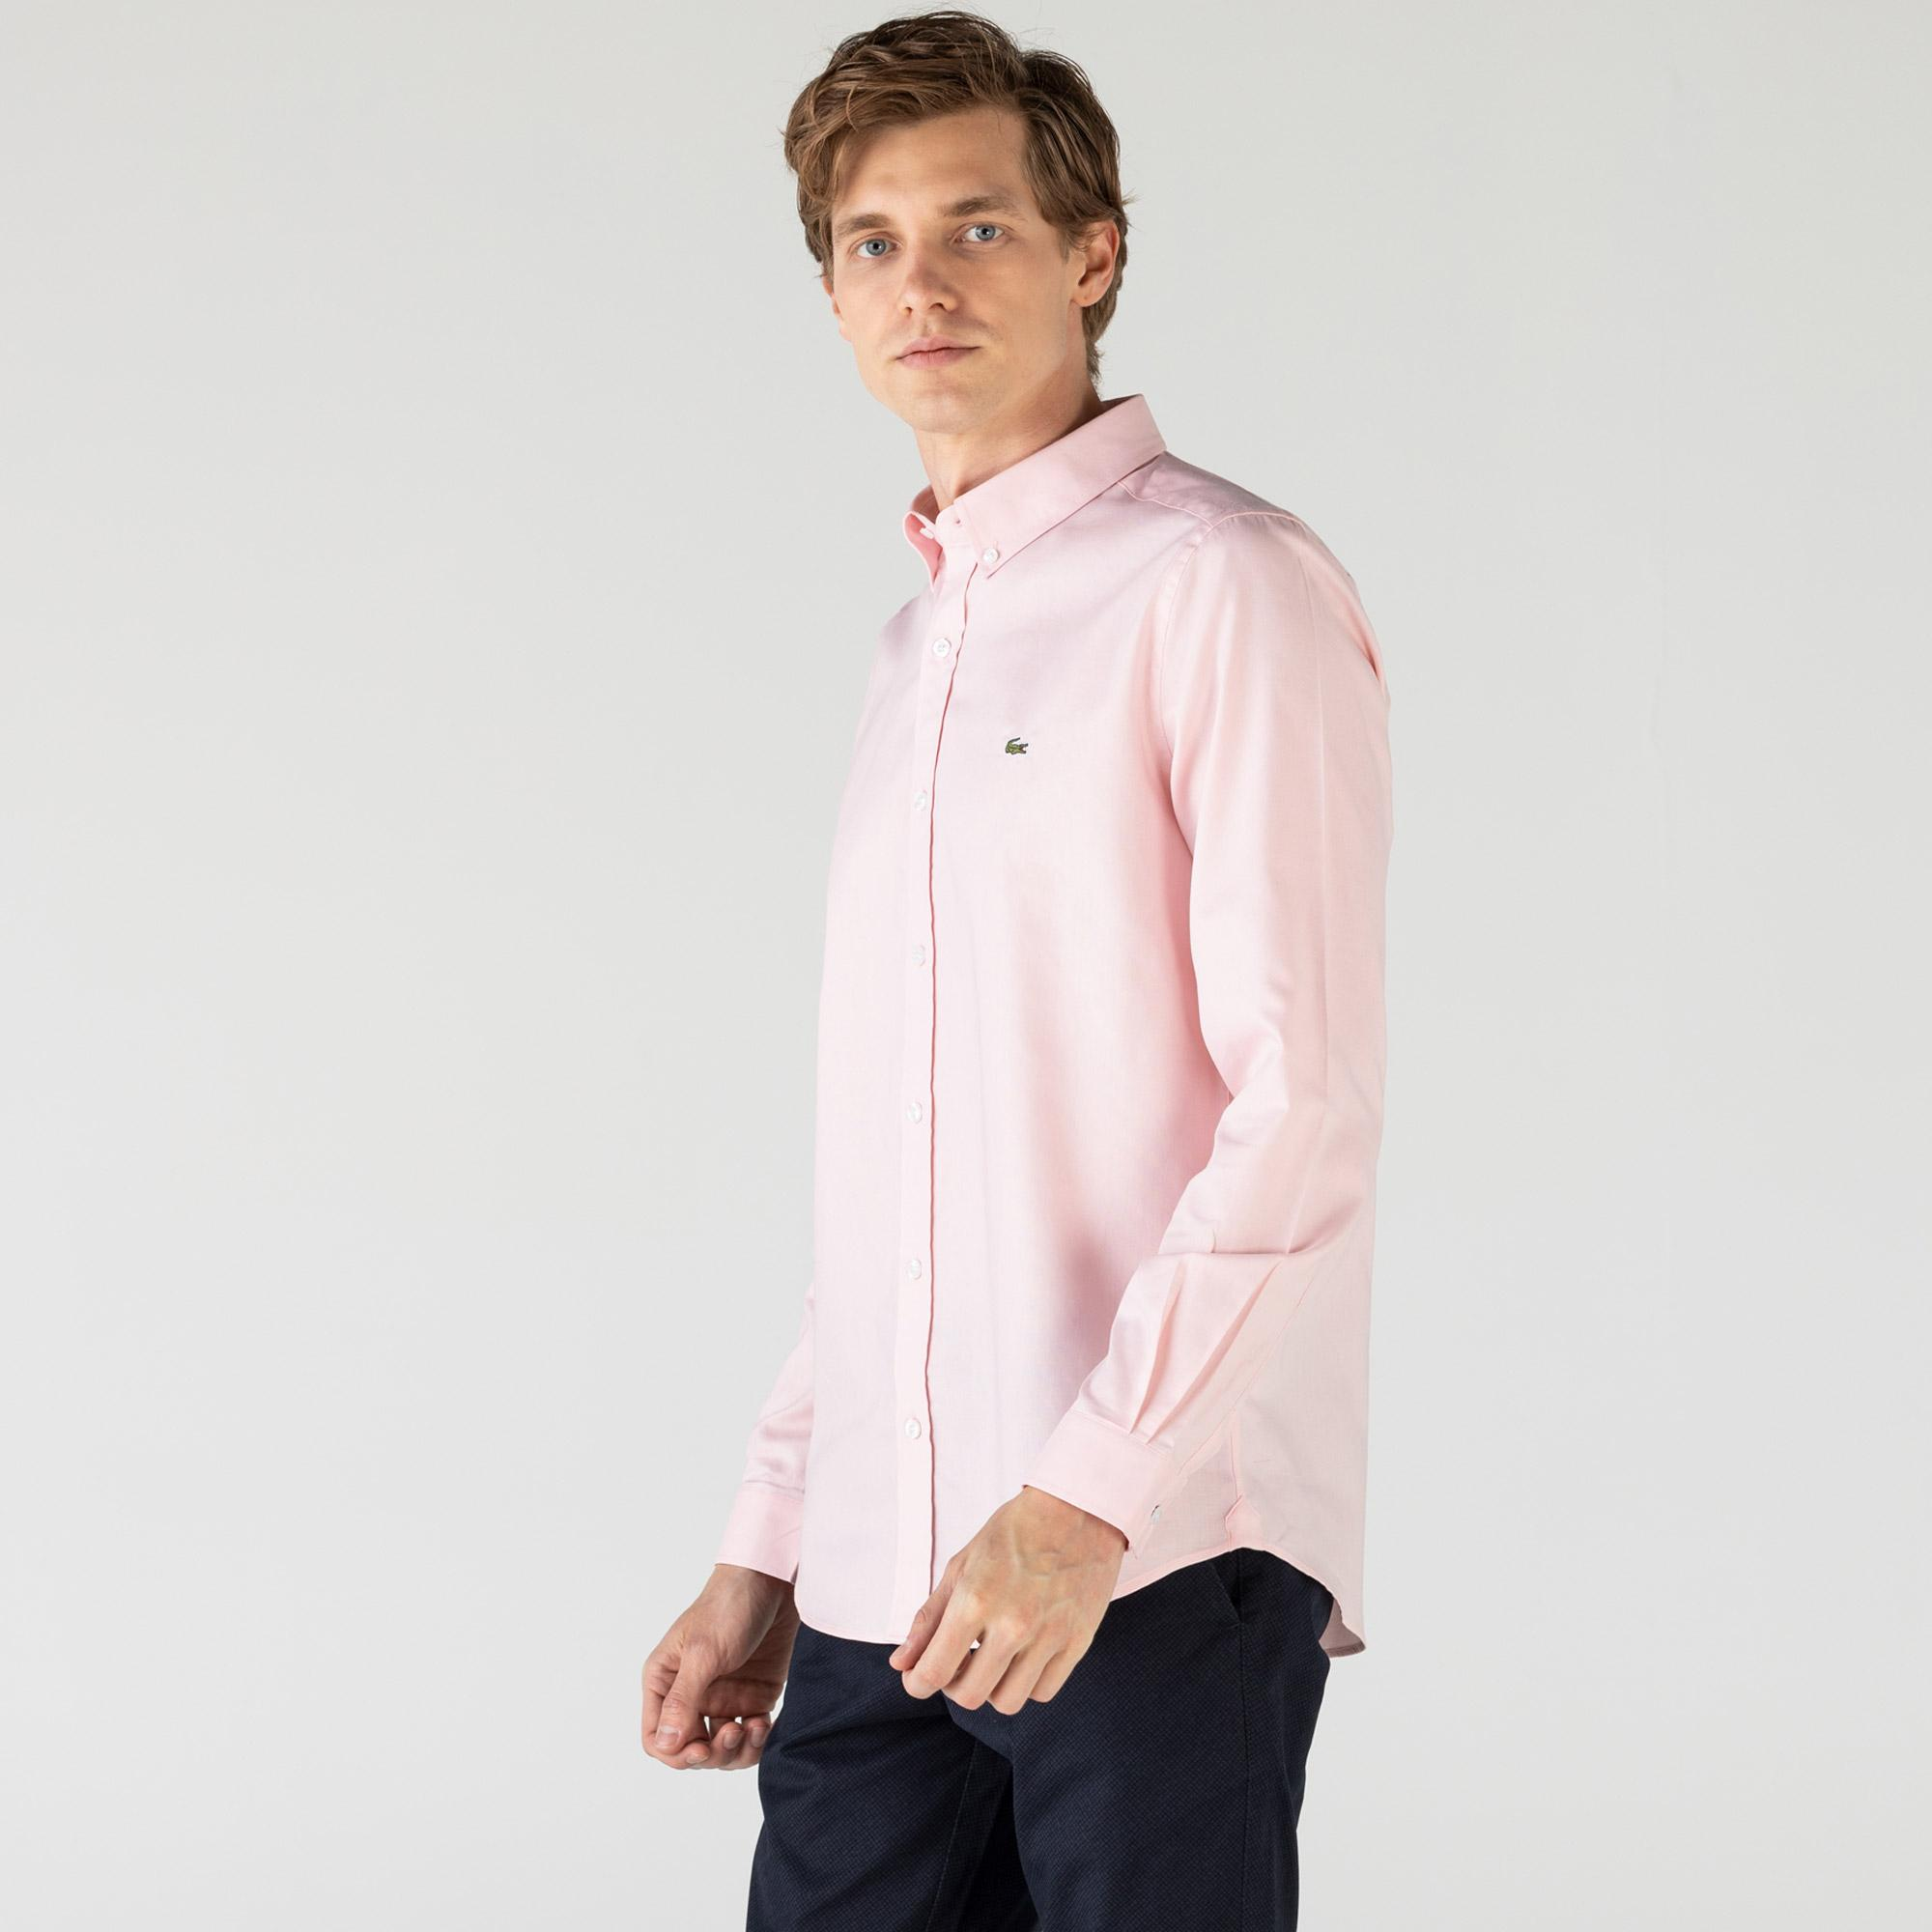 Lacoste Erkek Slim Fit Açık Pembe Gömlek